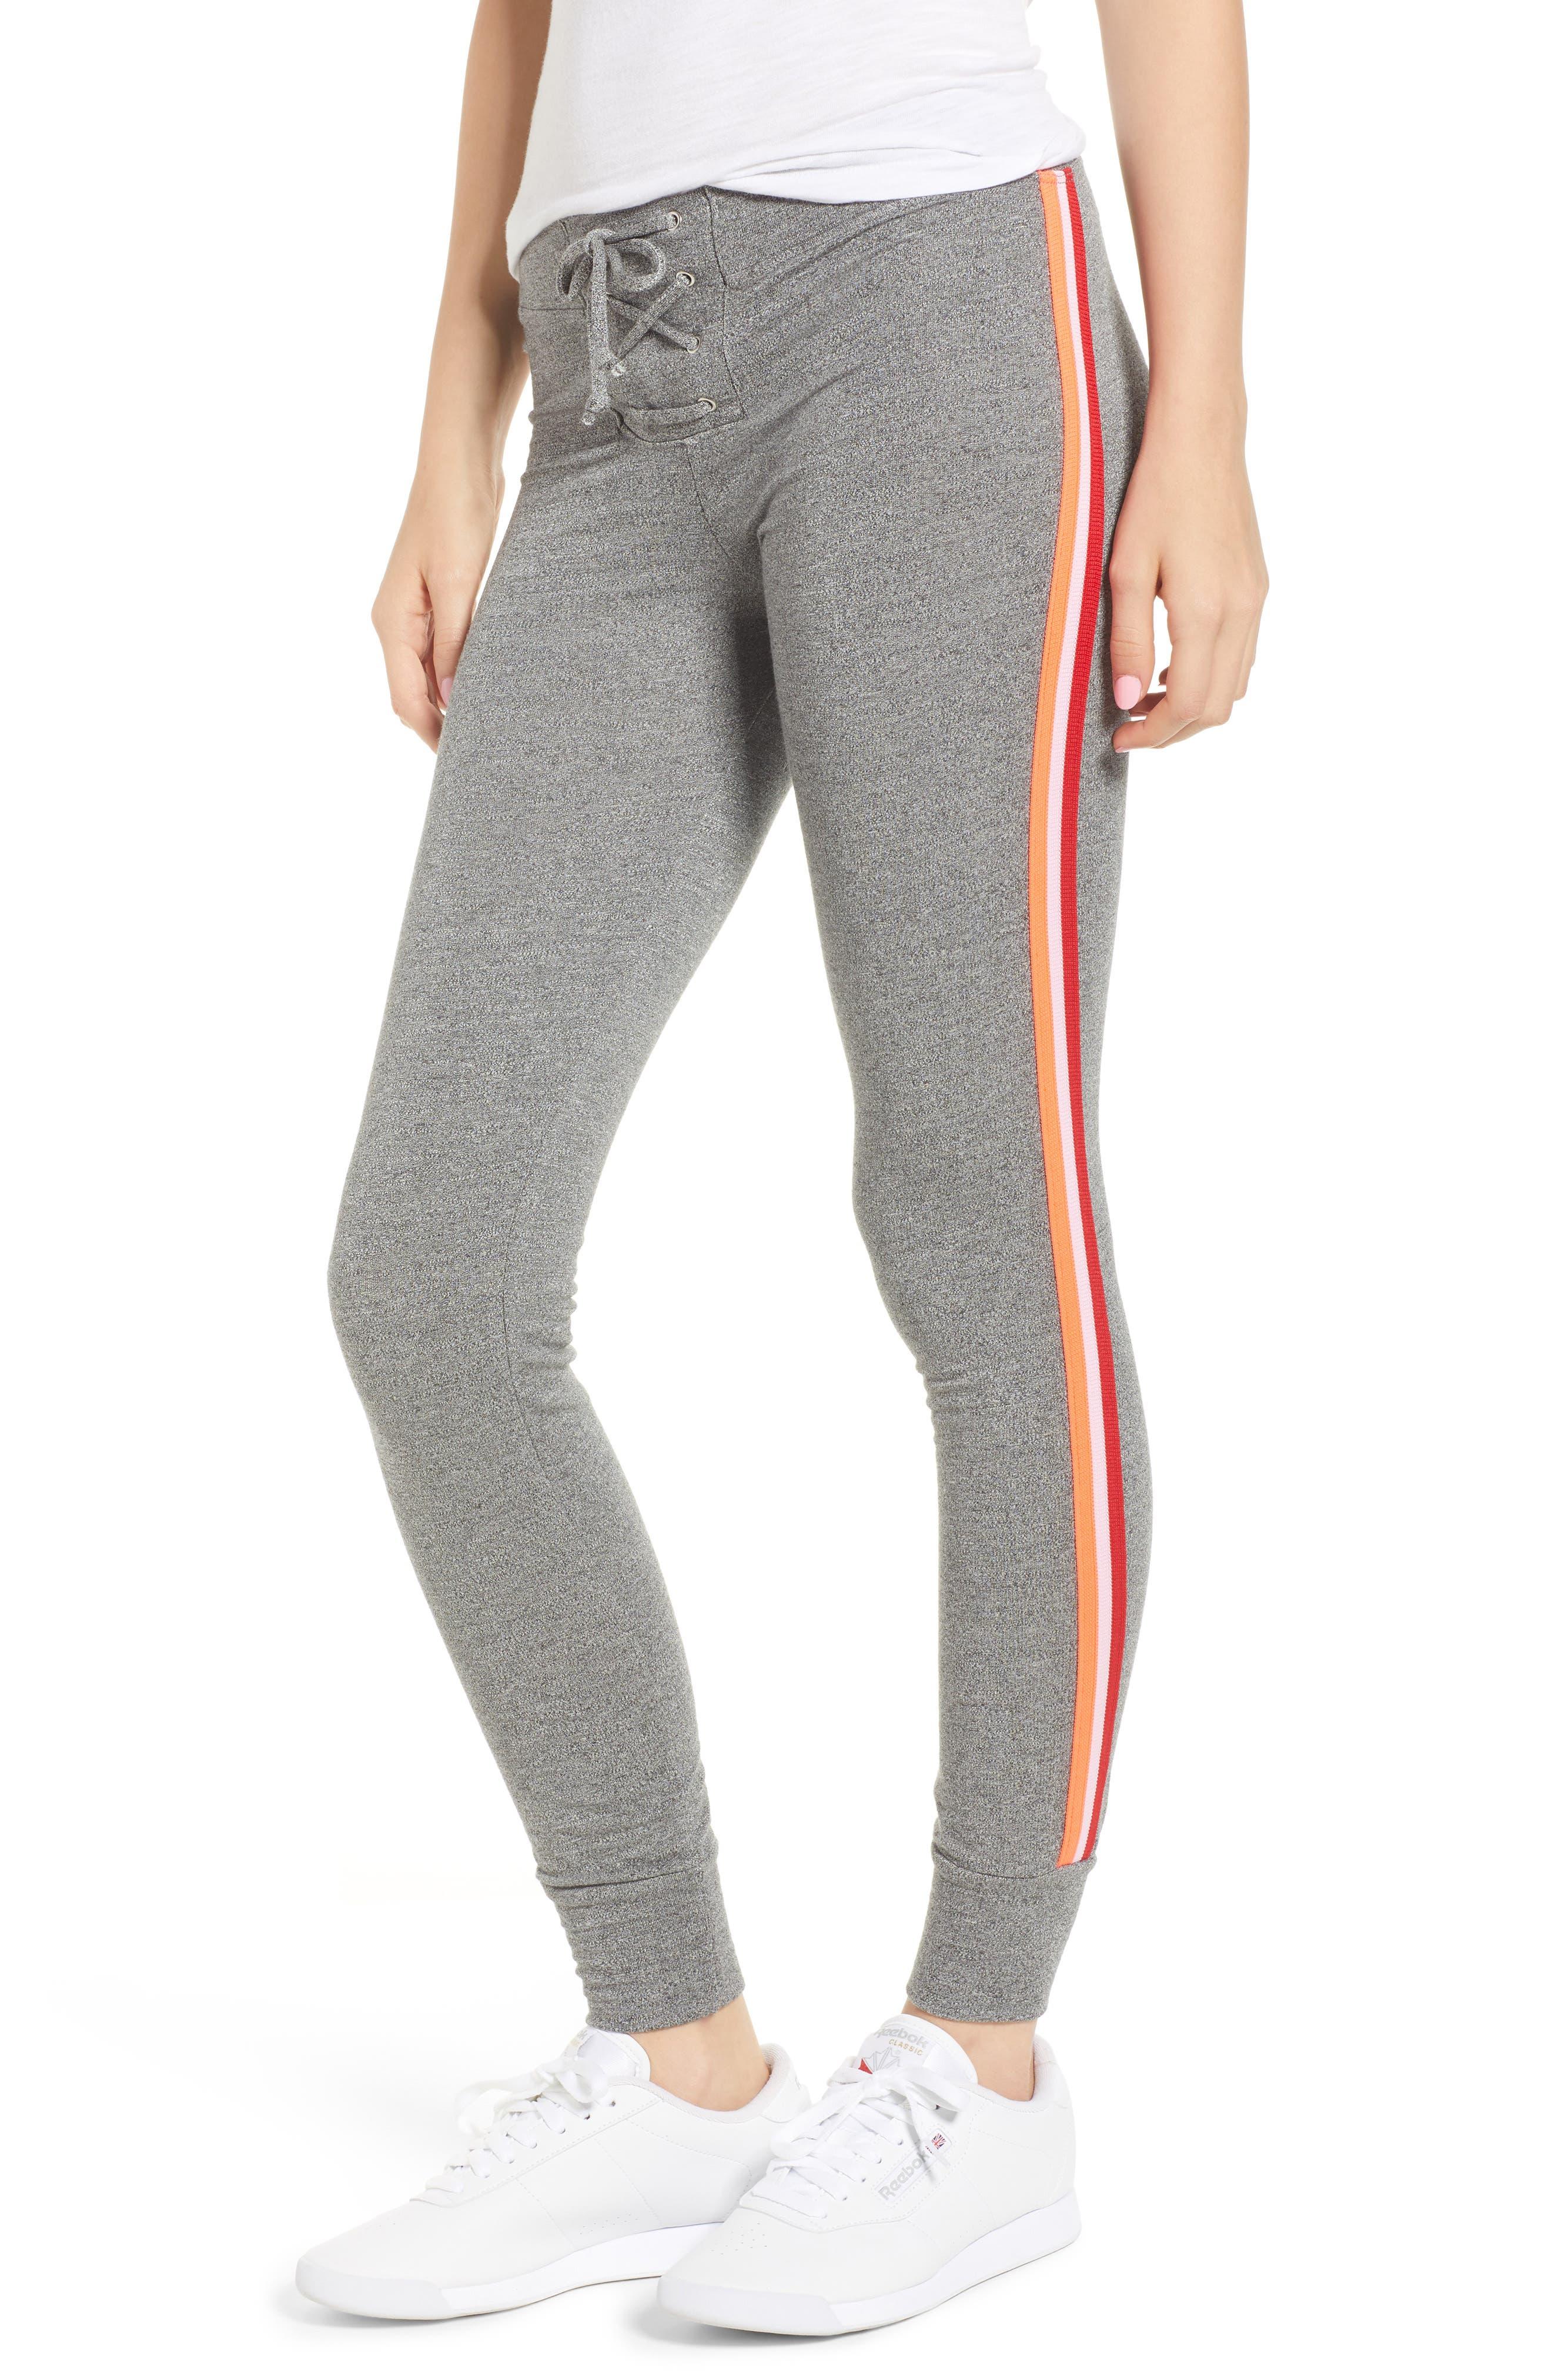 Sundry Lace-Up Skinny Sweatpants